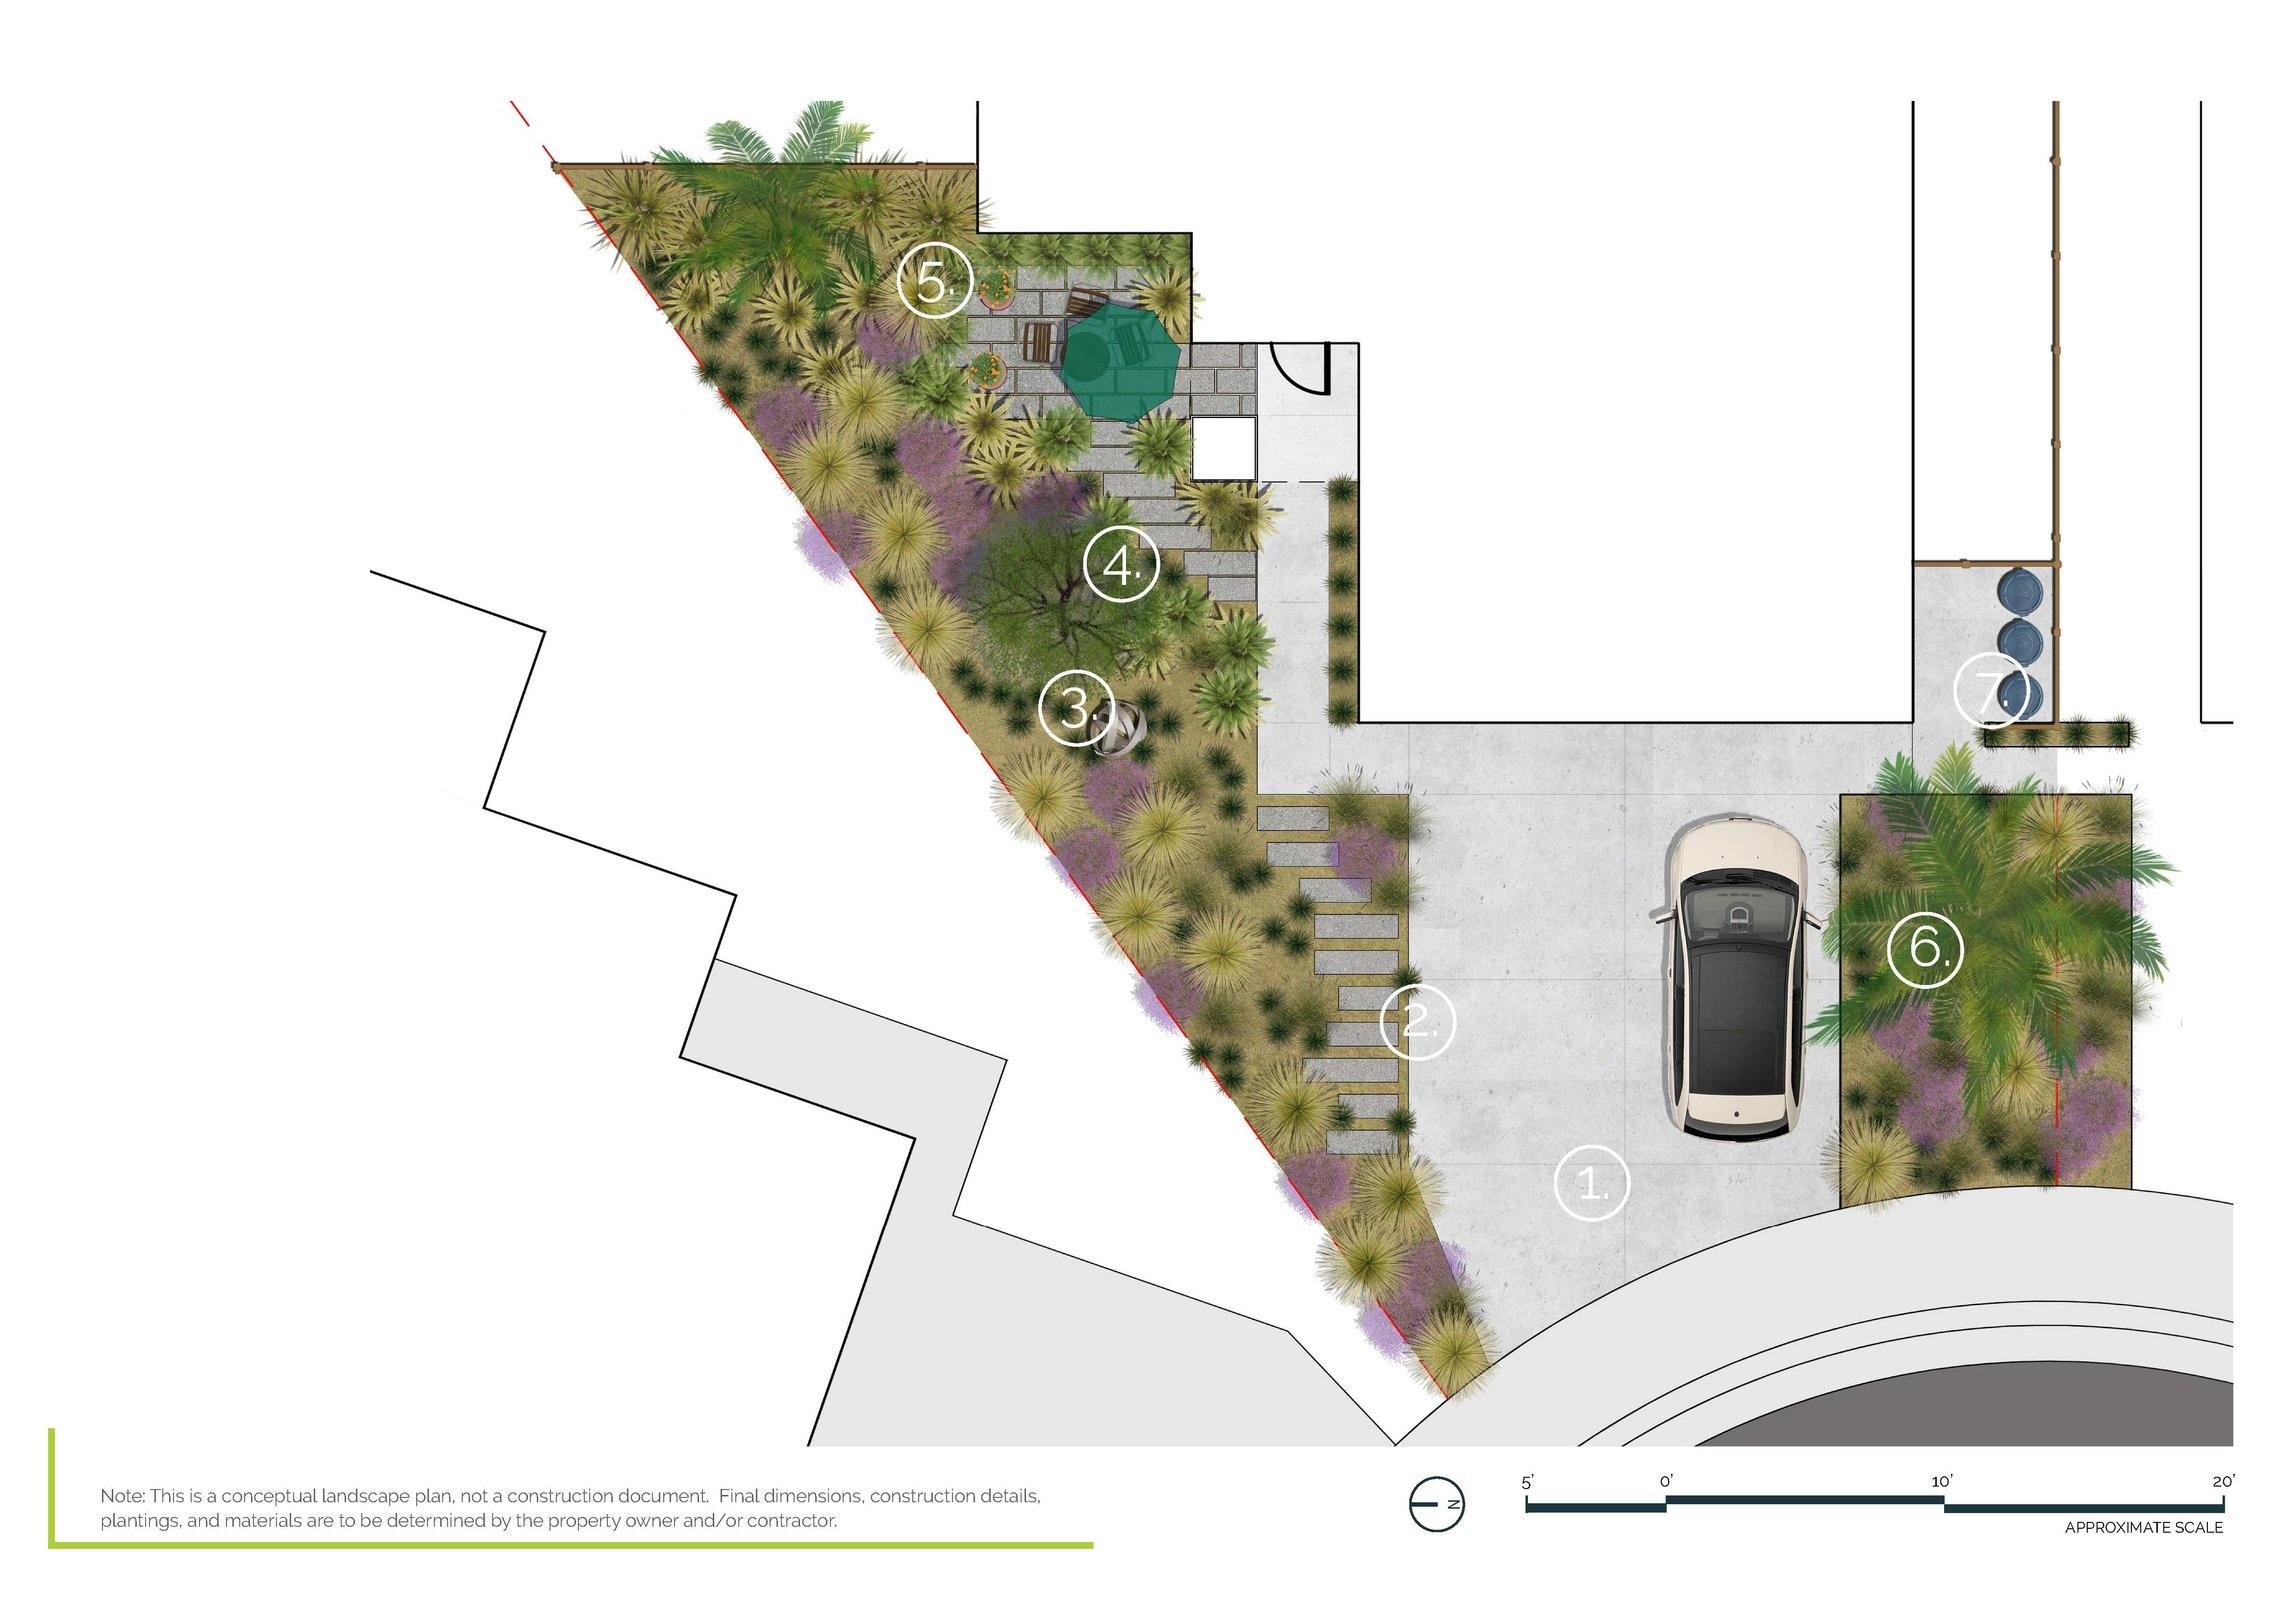 Water Wise Front Yard - Half Full Property PlanSacramento, CA